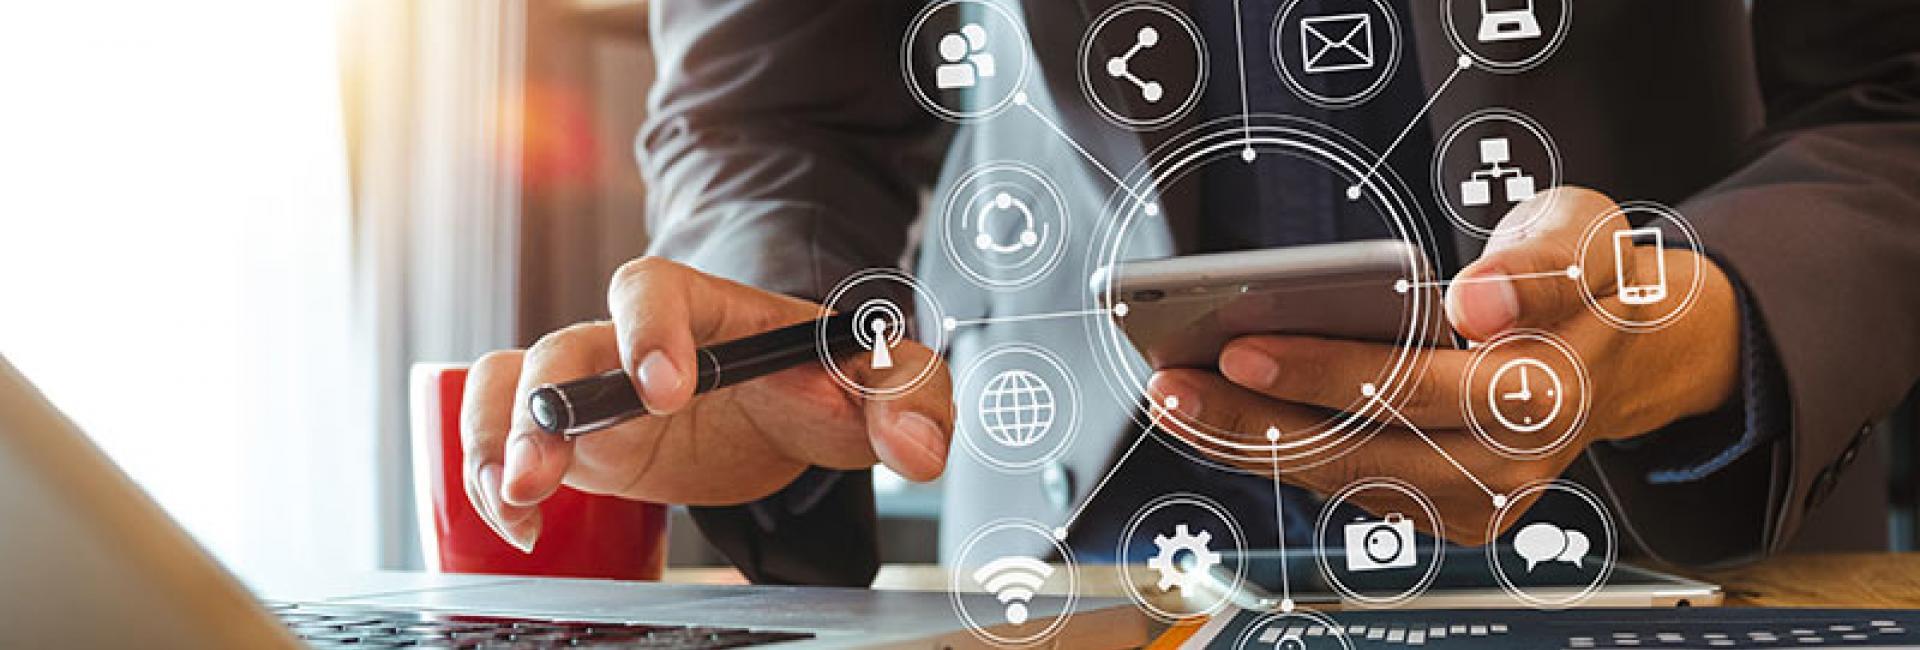 Data-Driven Retail Solution-e4348a68